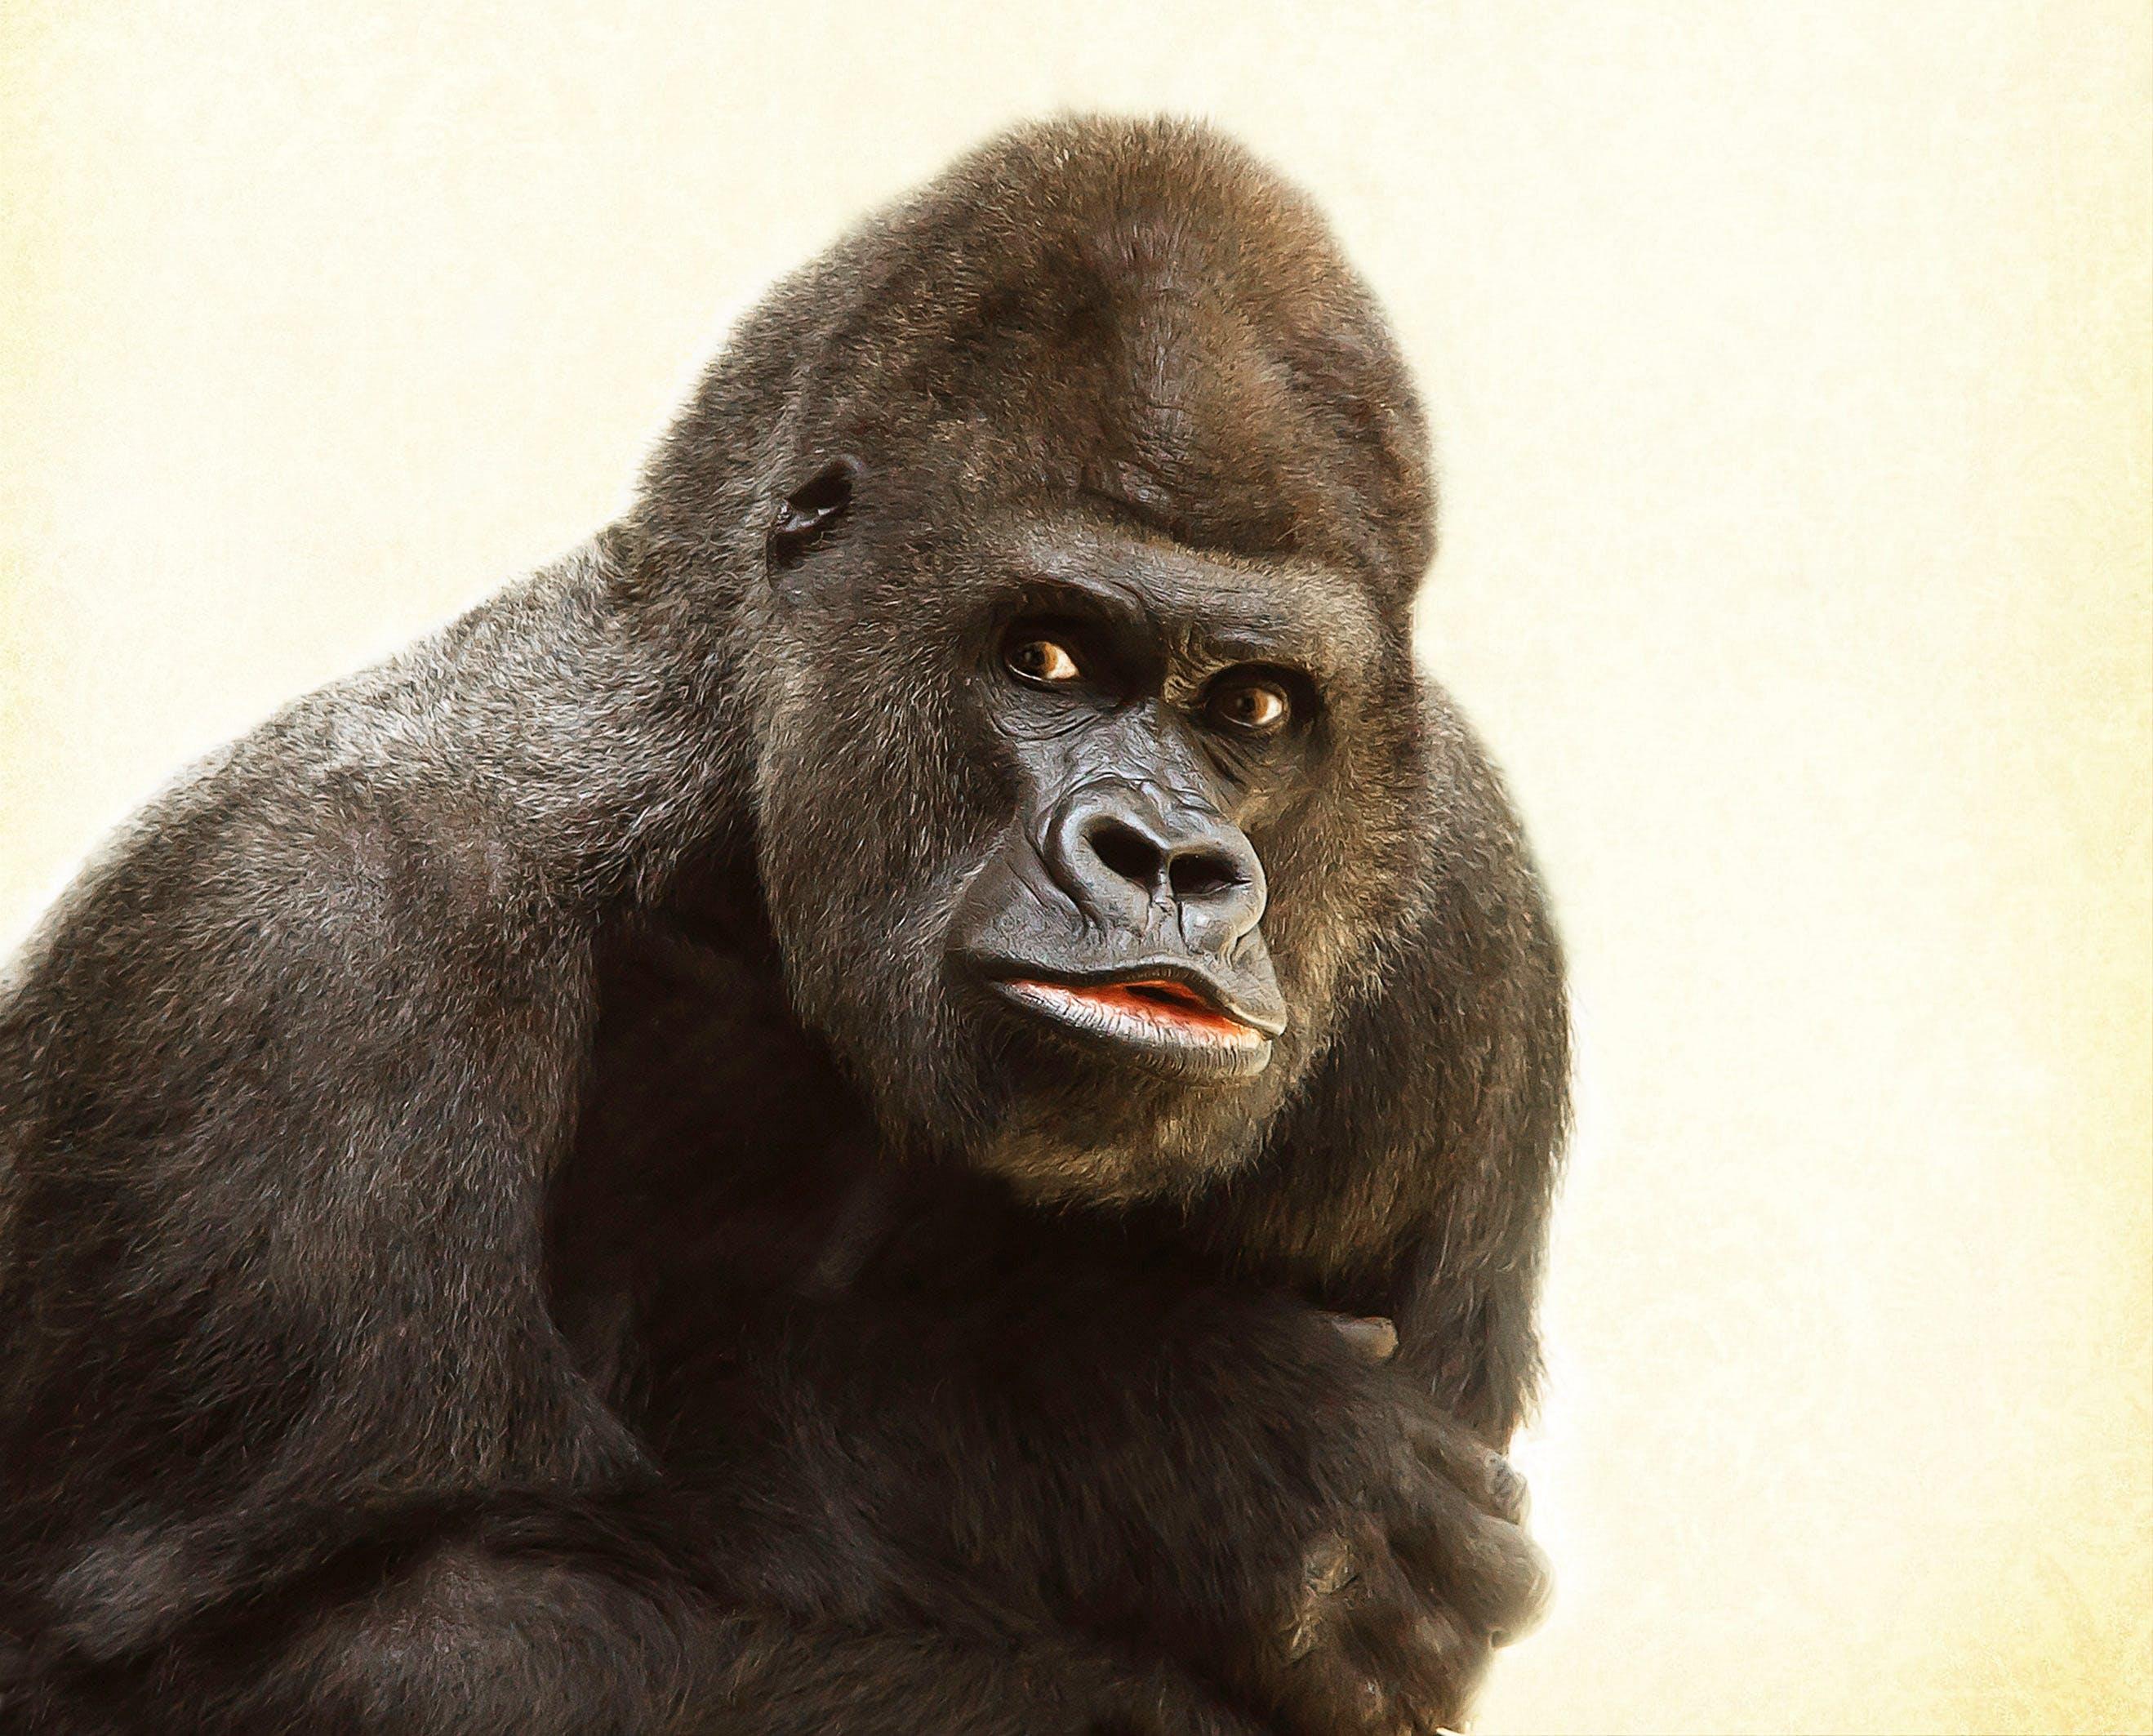 Foto profissional grátis de animal, desajeitado, gorila, gorila de silverback